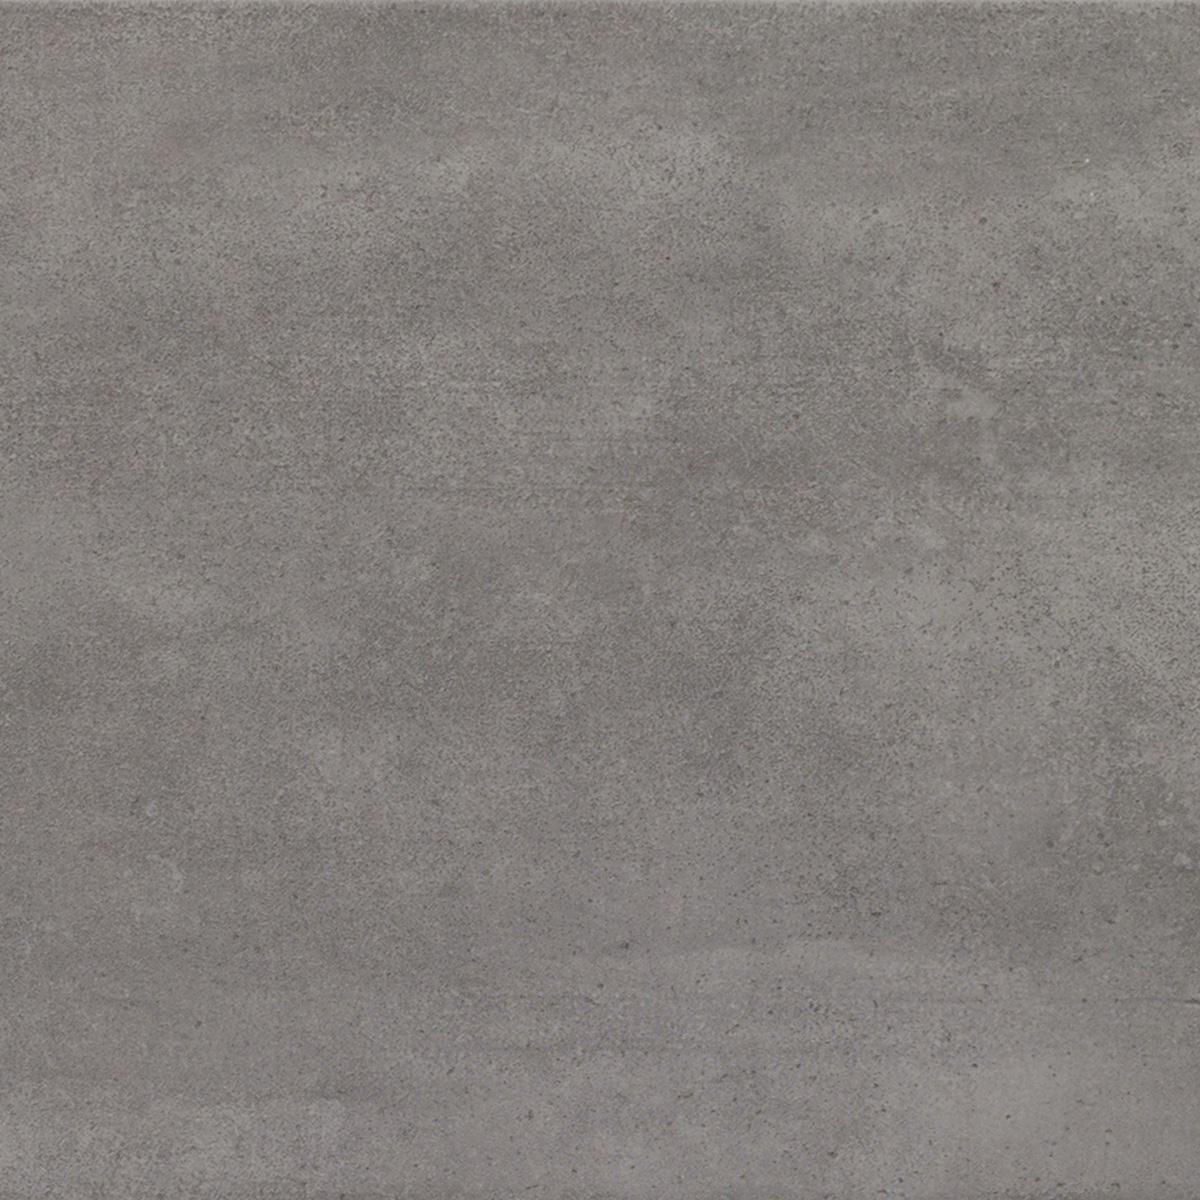 Gresie glazurata SIDNEY - Graphit 45x45 GALA - Poza 12